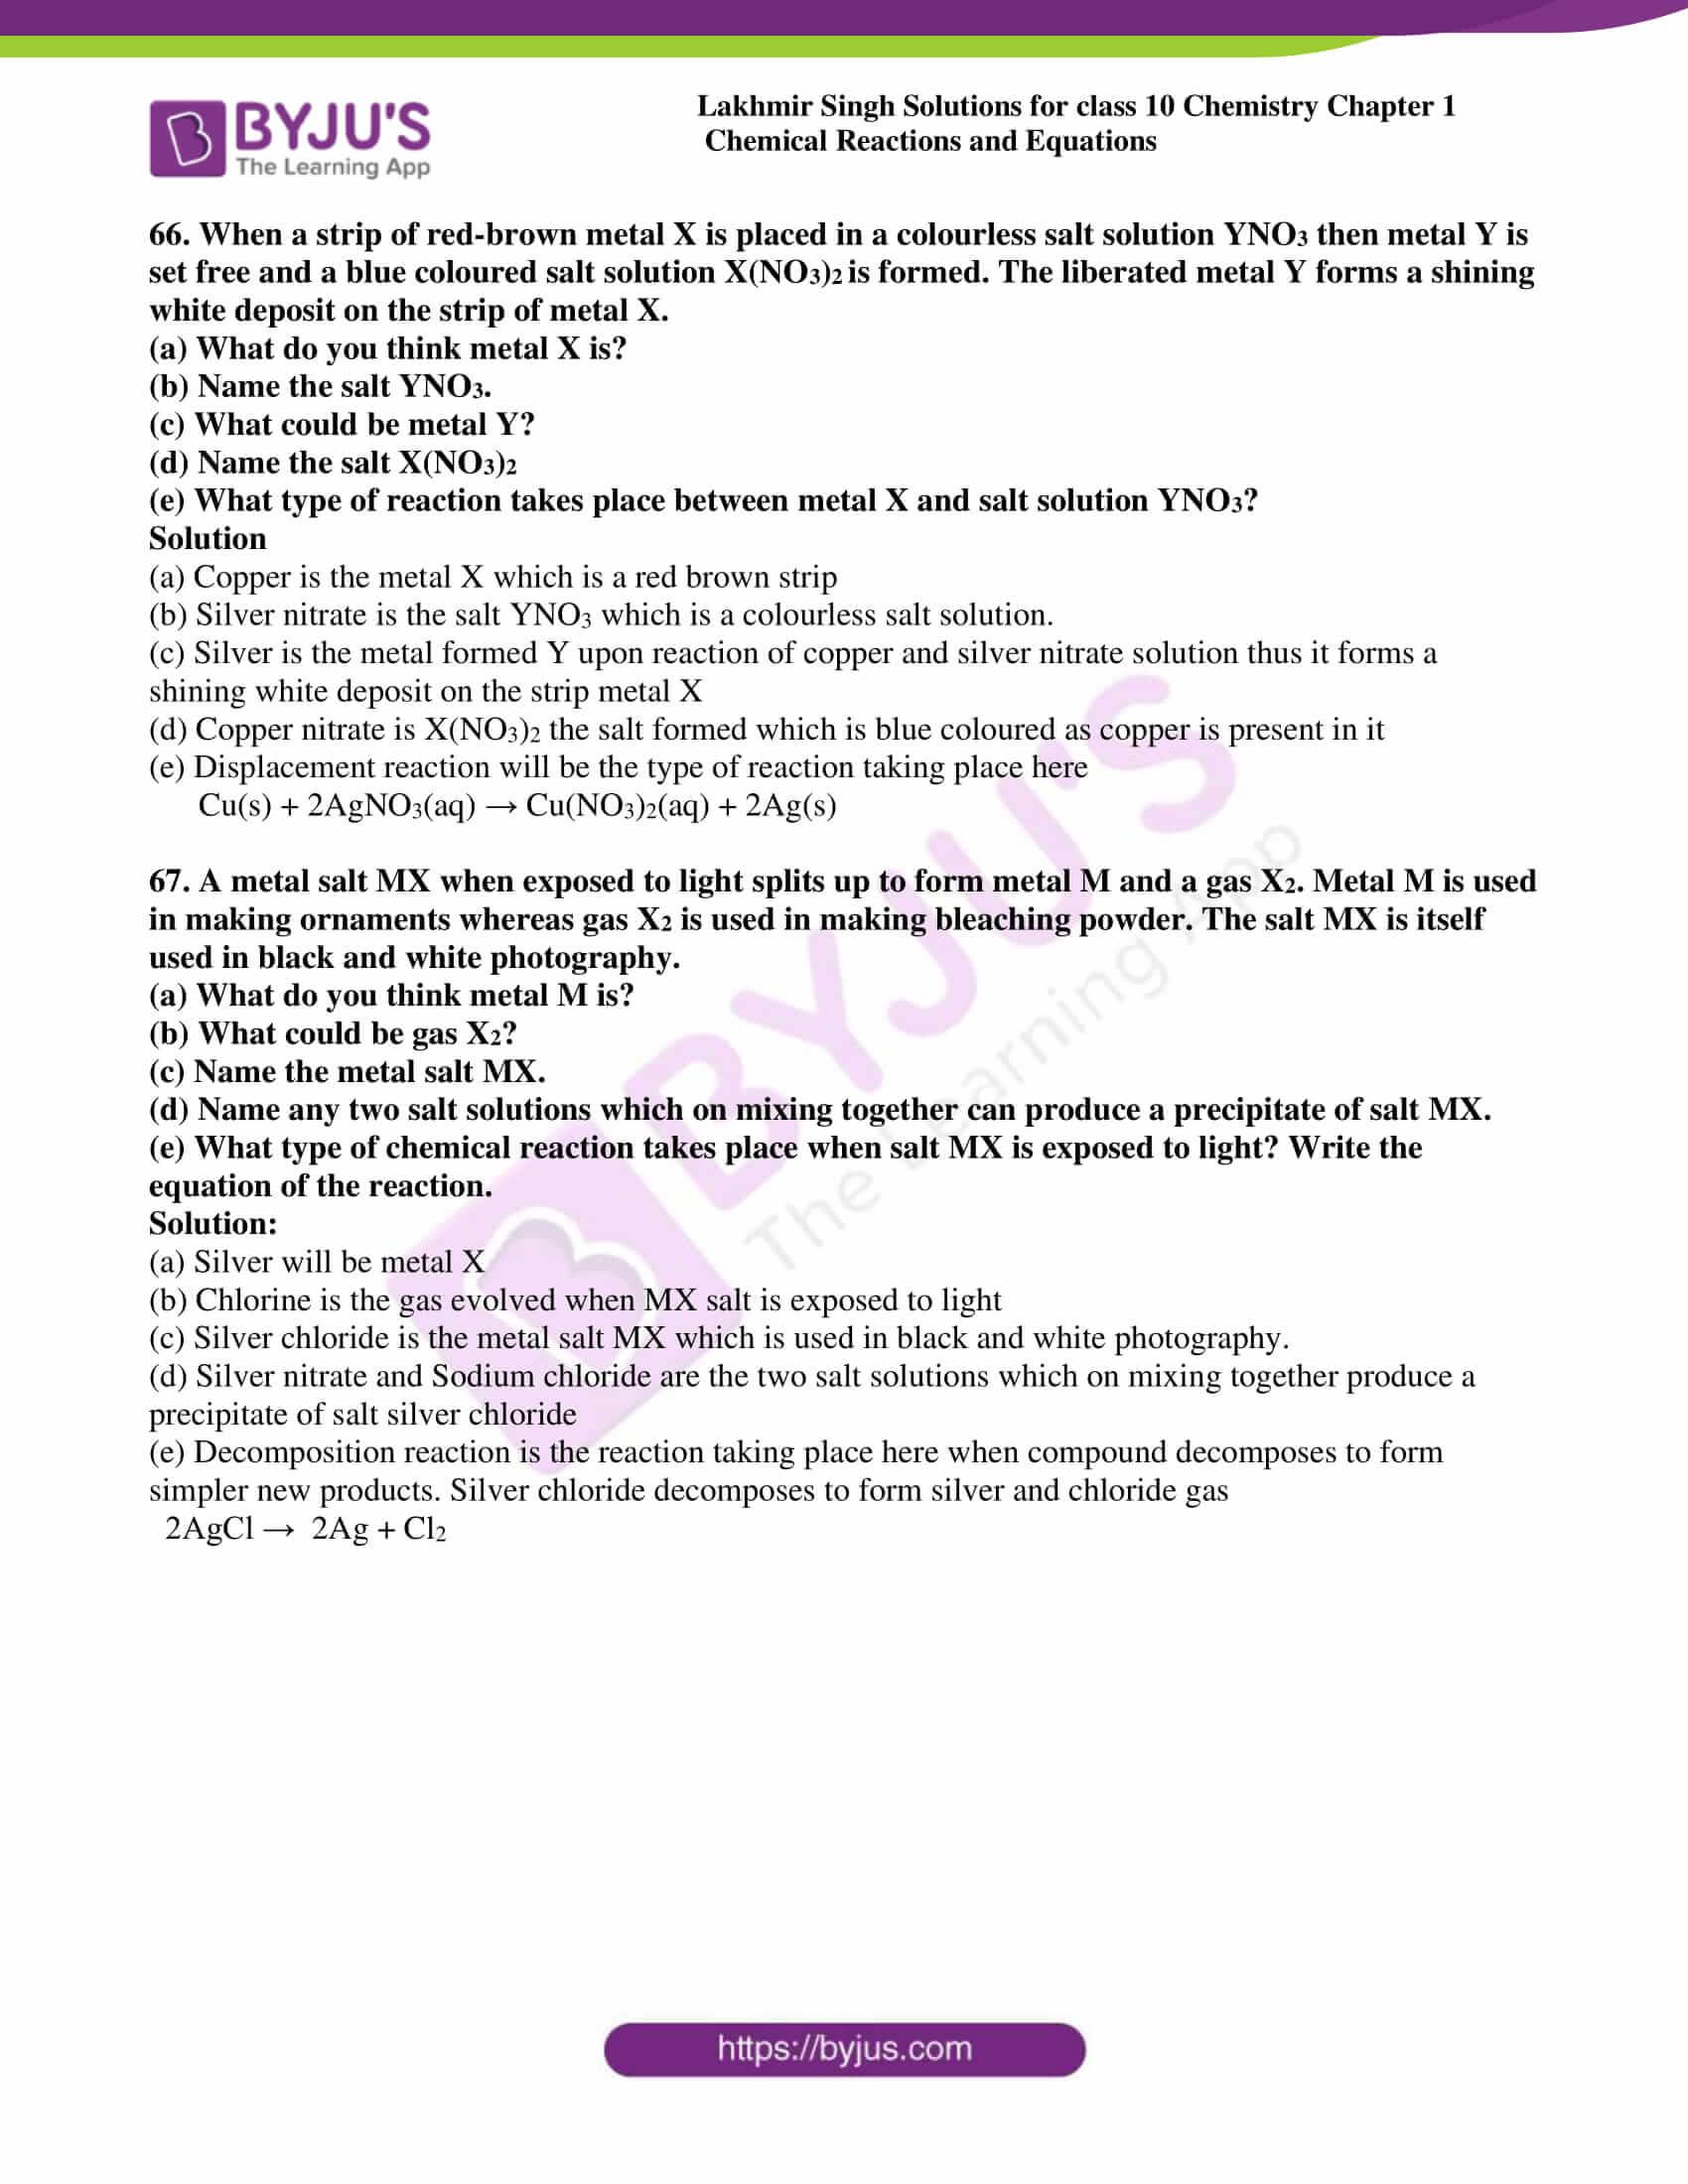 lakhmir singh sol class 10 che chapter 1 32